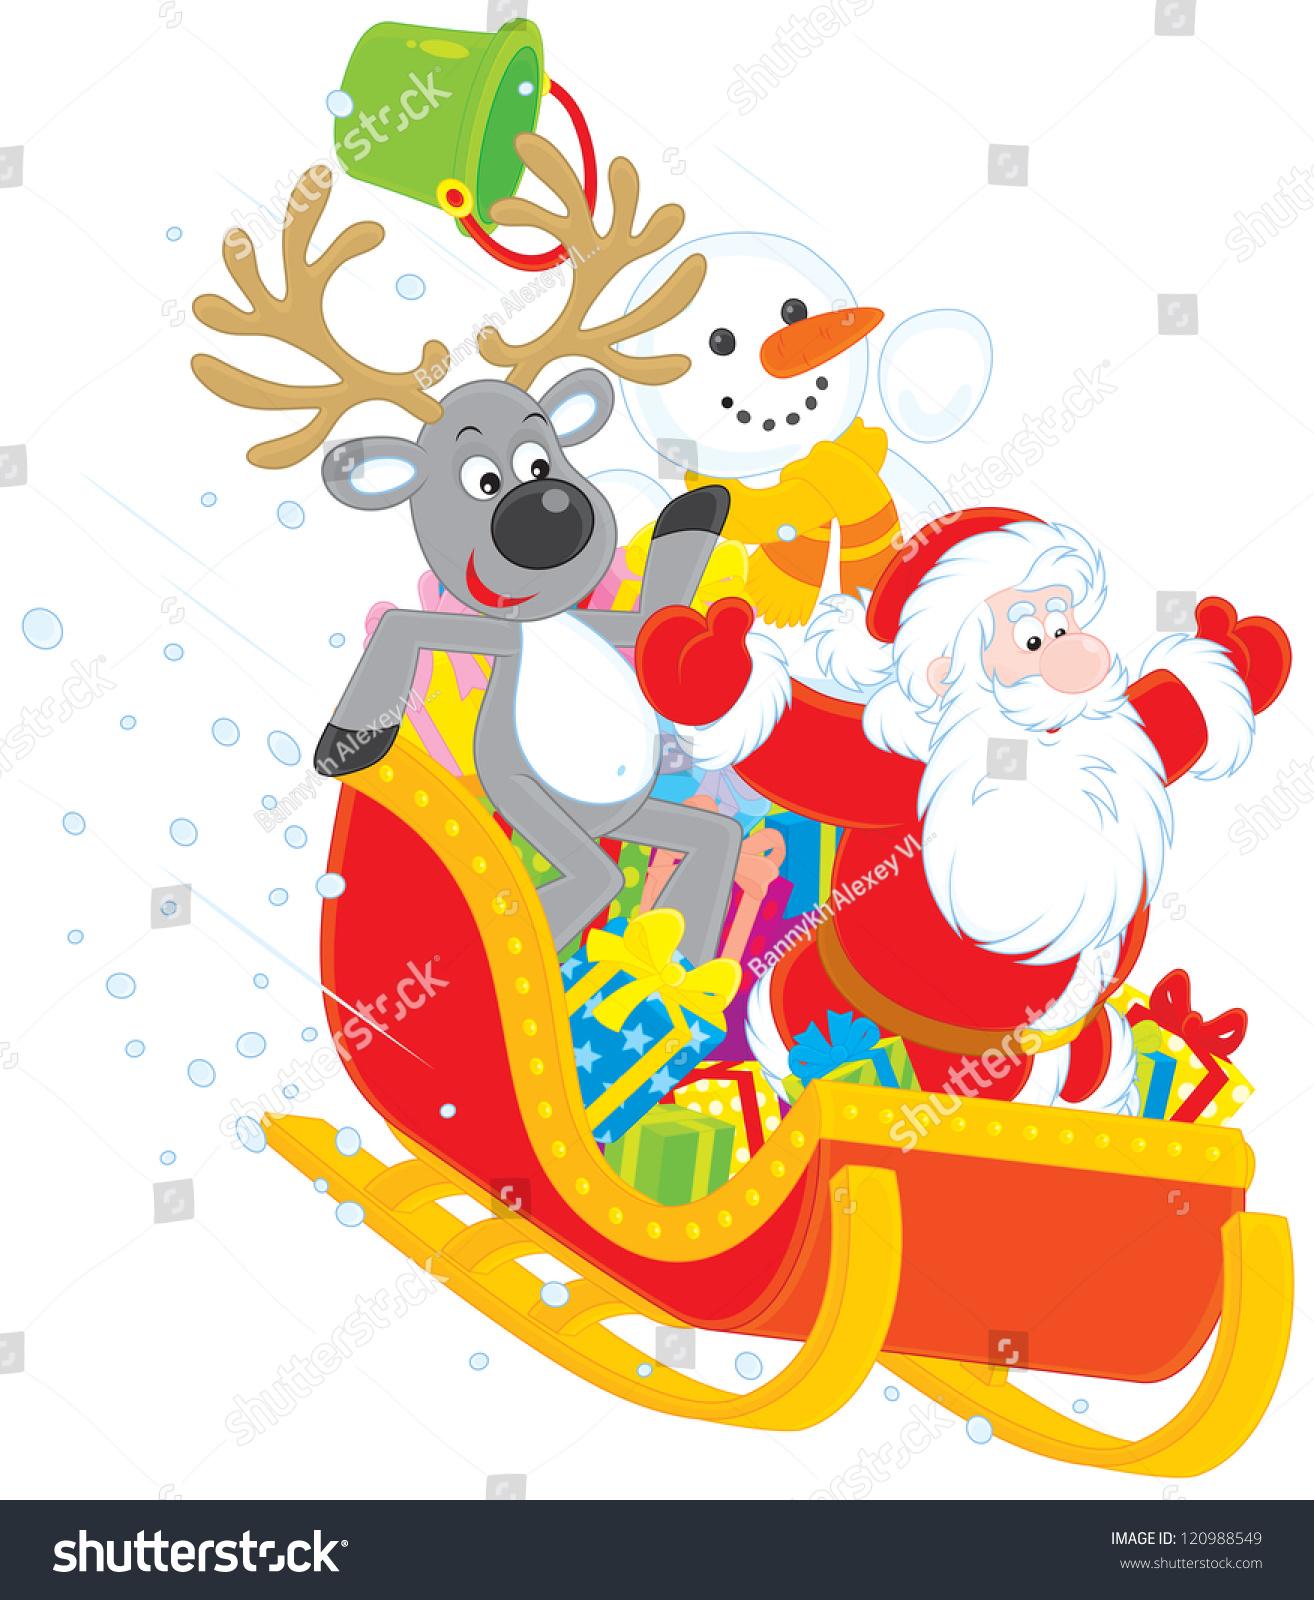 santa claus reindeer snowman sliding down stock vector 120988549